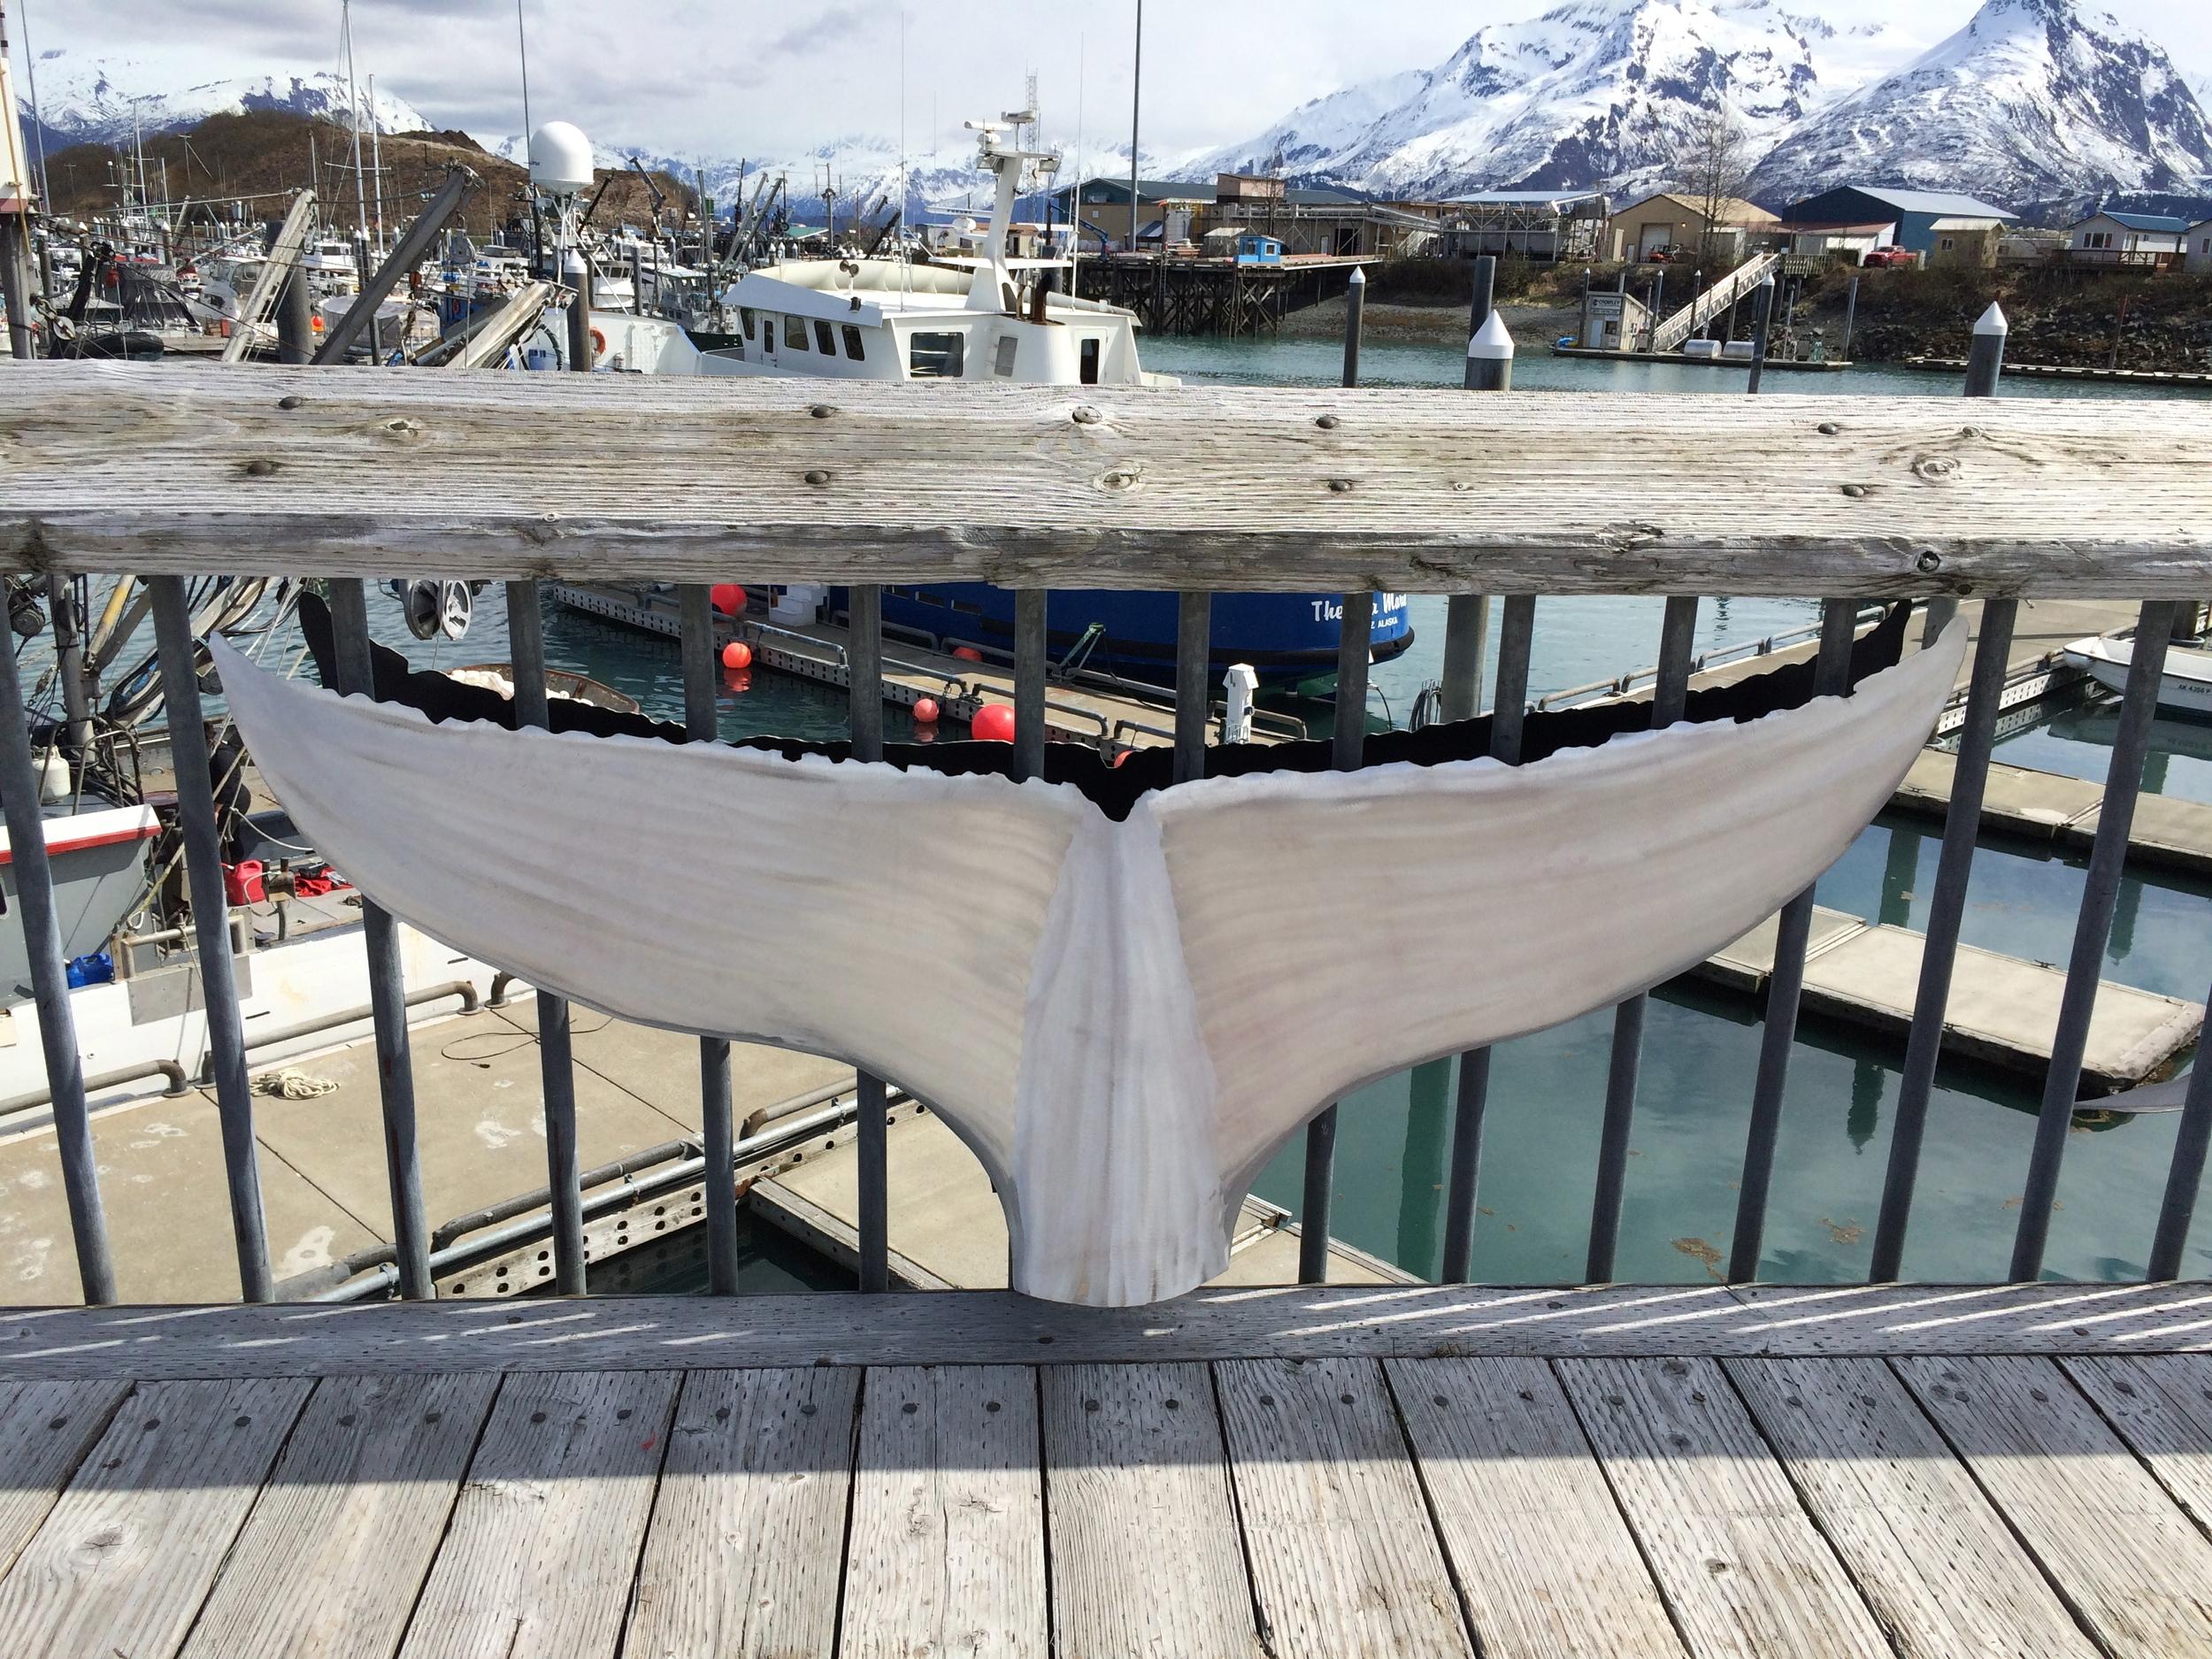 Aluminum Whale Tail At Valdez Boat Harbor